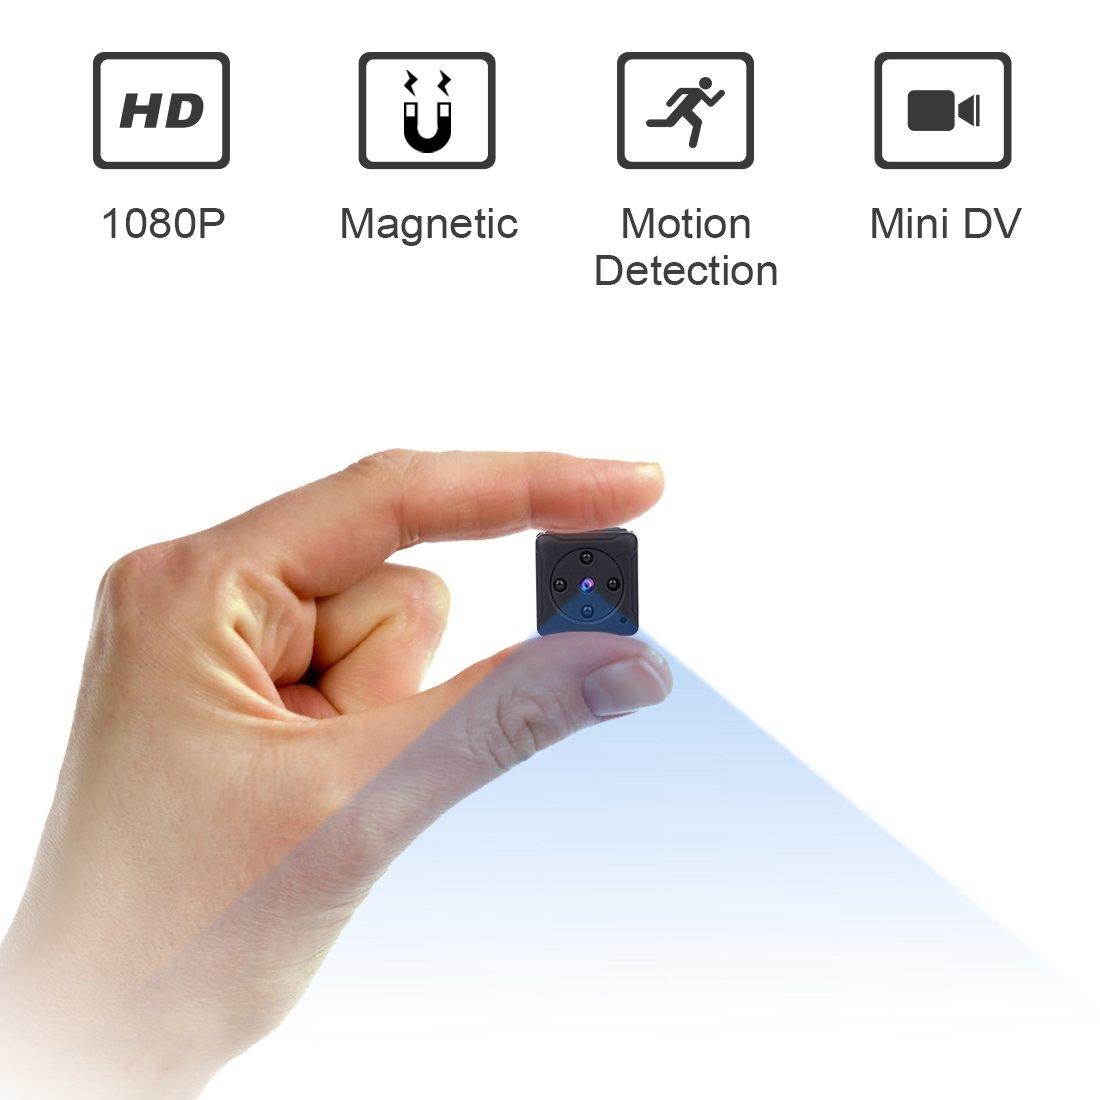 ZZCP ミニスパイカメラ、1080Pの携帯用の小型の HD の秘密乳母カムと夜間視力と運動の検出、屋内/屋外ワイヤレスセキュリティカメラ、家庭やオフィス向けの完全隠しのカメラ (黒い) B079KJMP7K